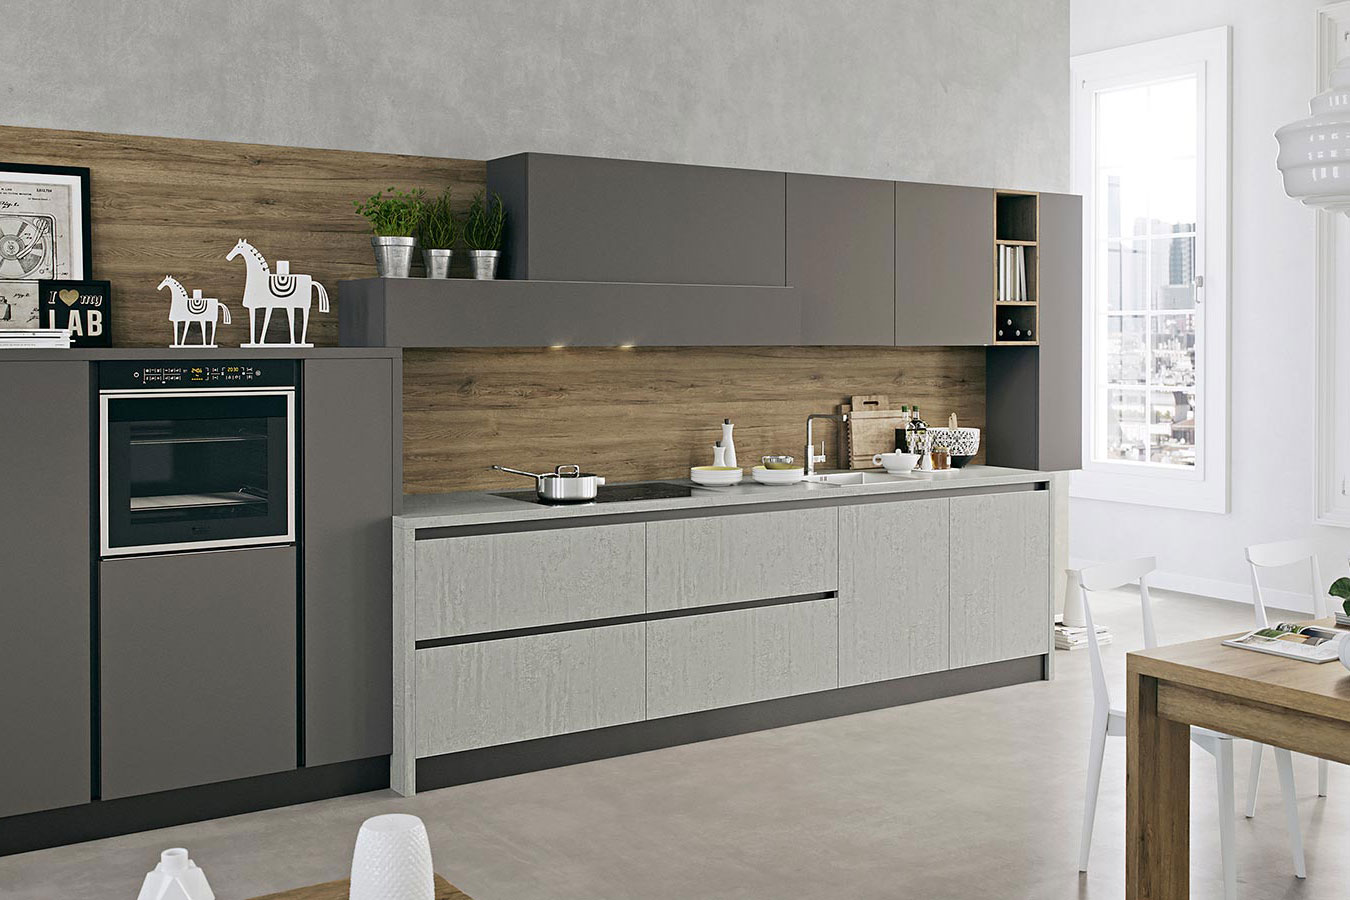 Cucina kal di arredo3 righetti mobili novara for Cucine da arredo